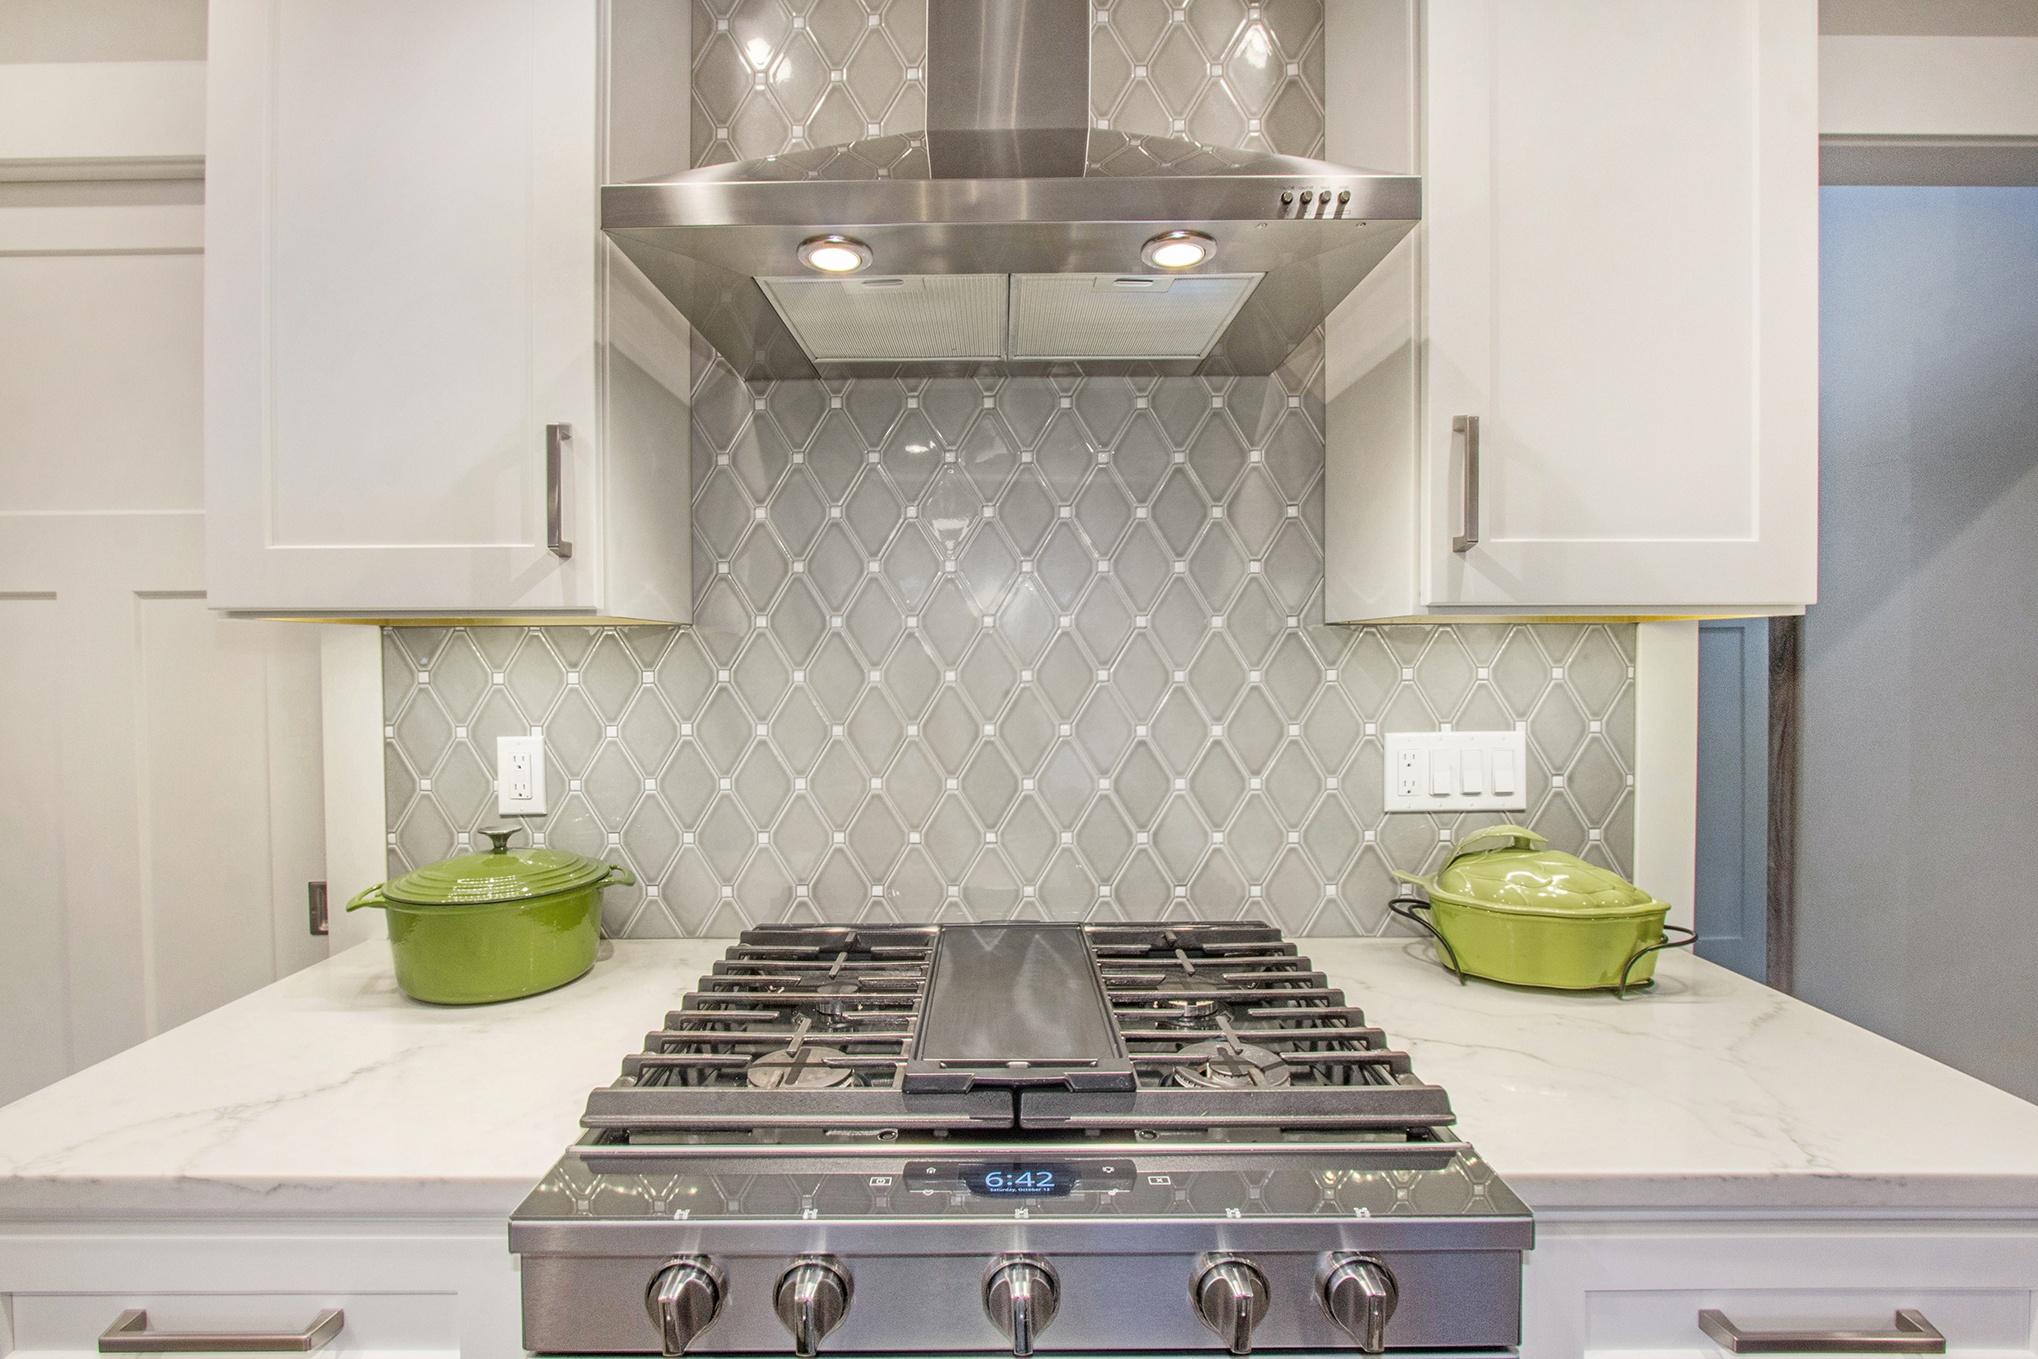 Custom Home Chef's Range with Hood Vent and Custom Tile Wall